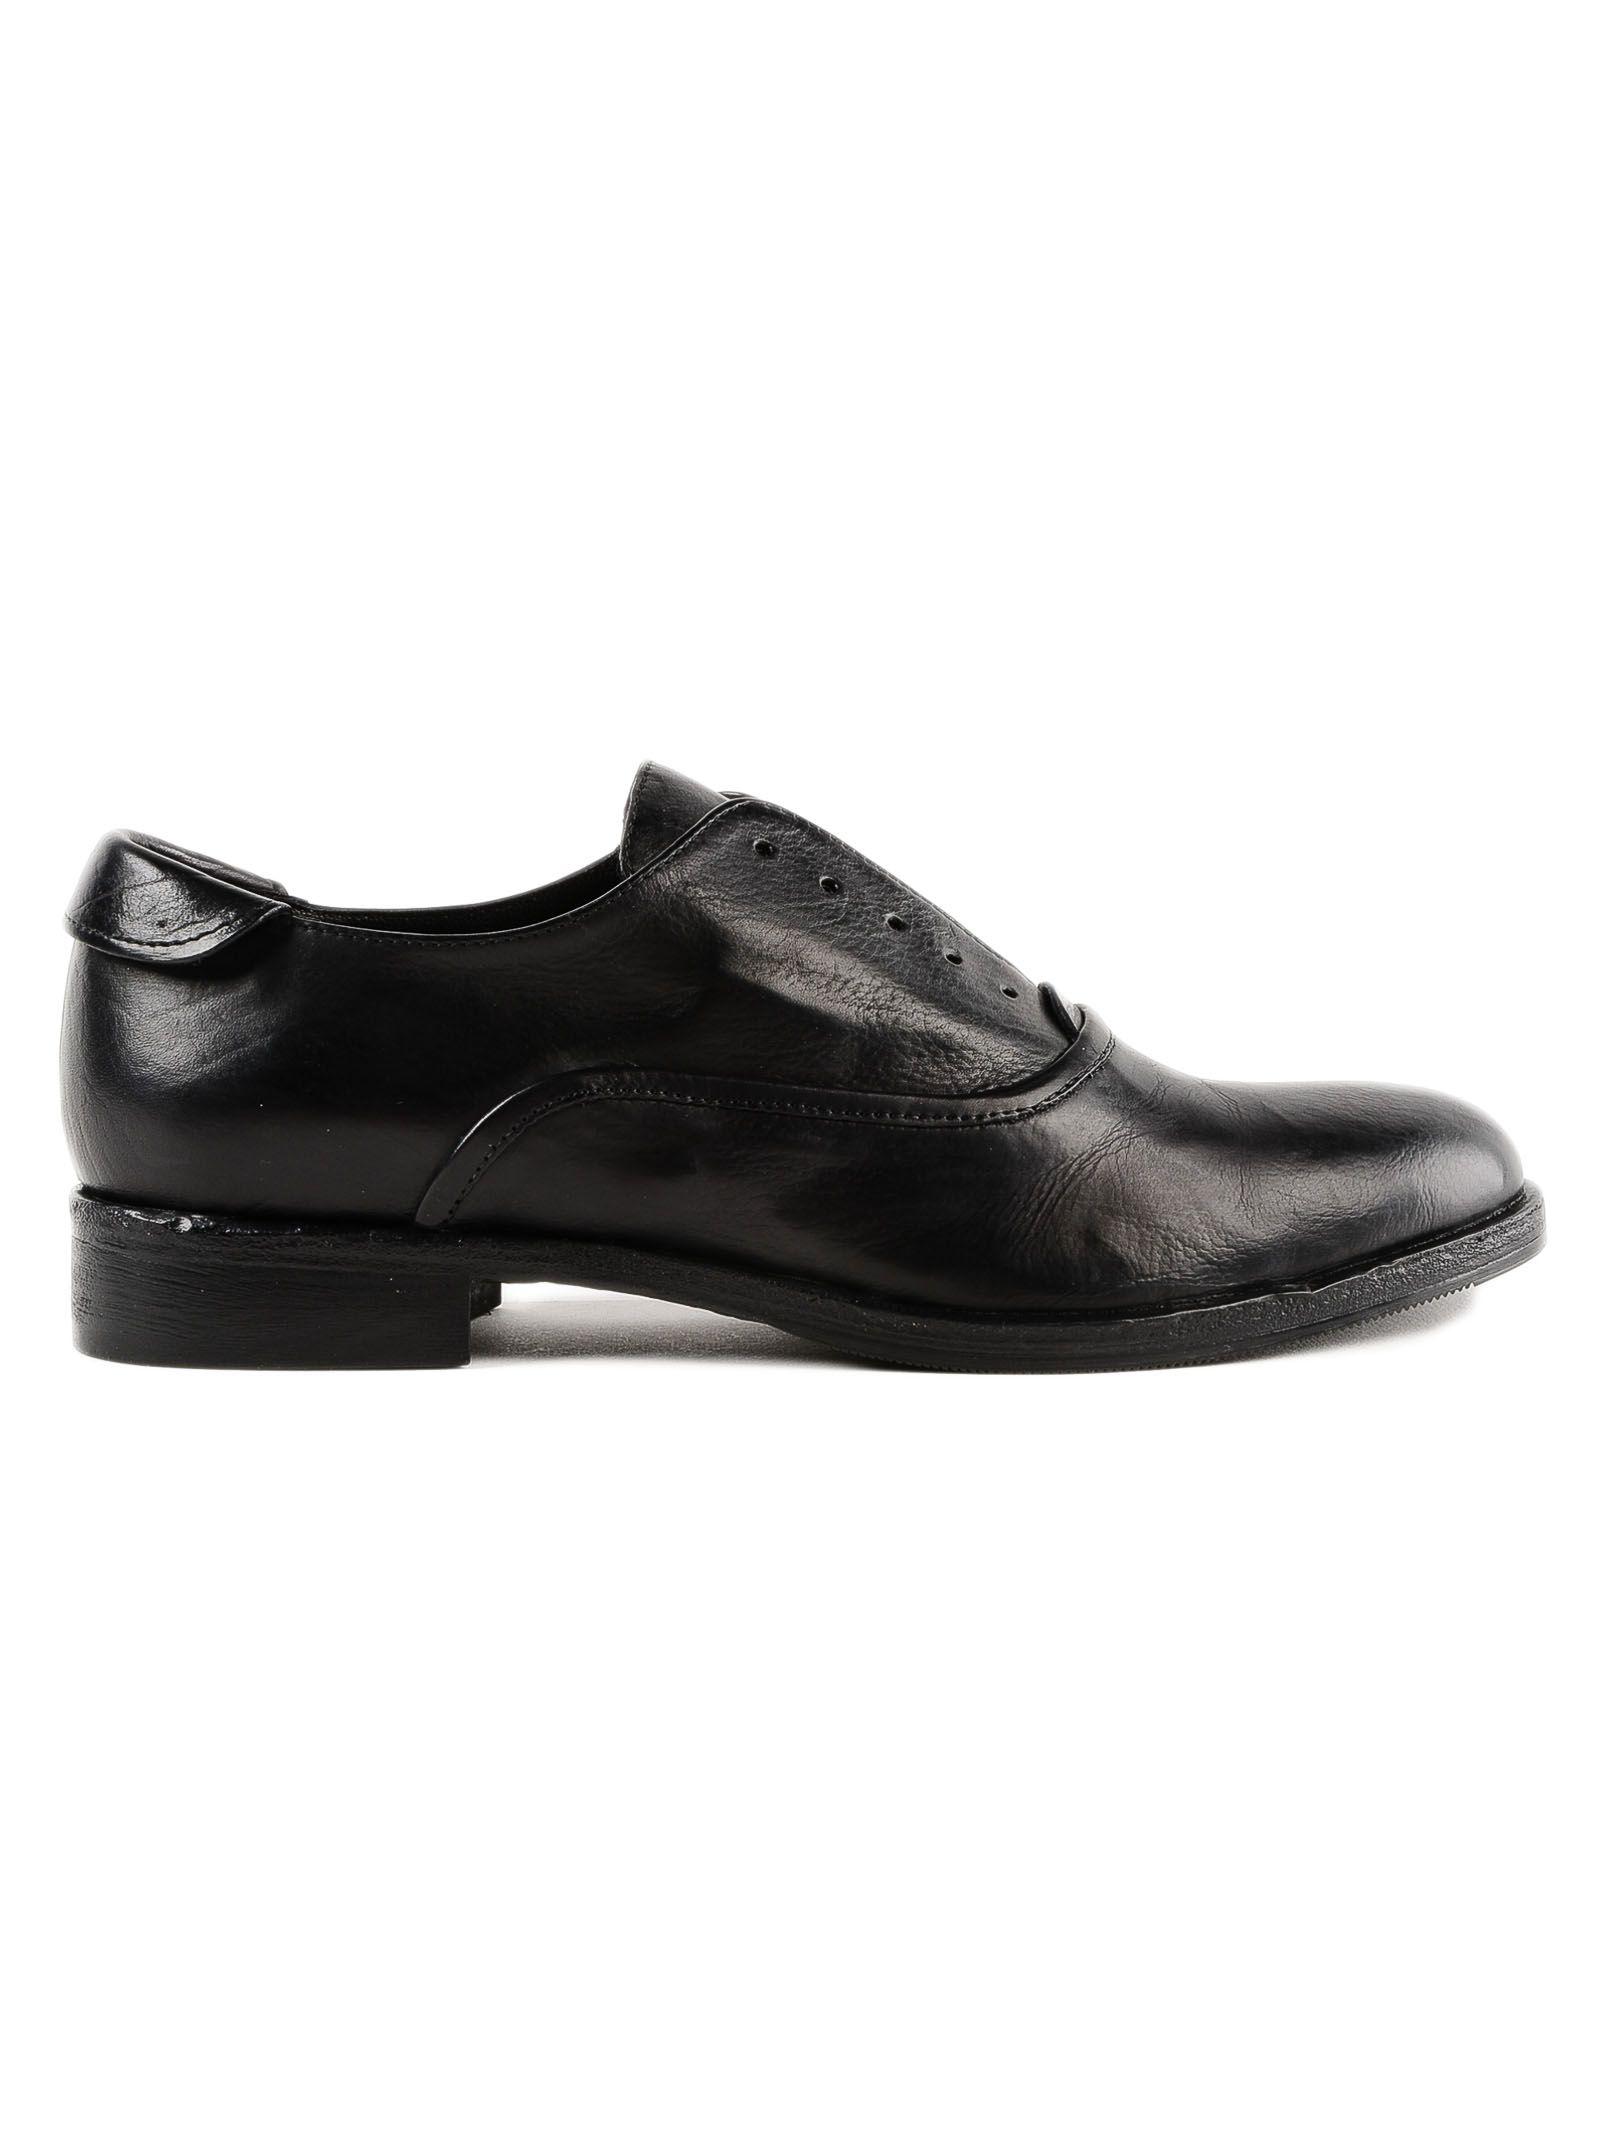 Twin Set Laceless Oxford Shoes